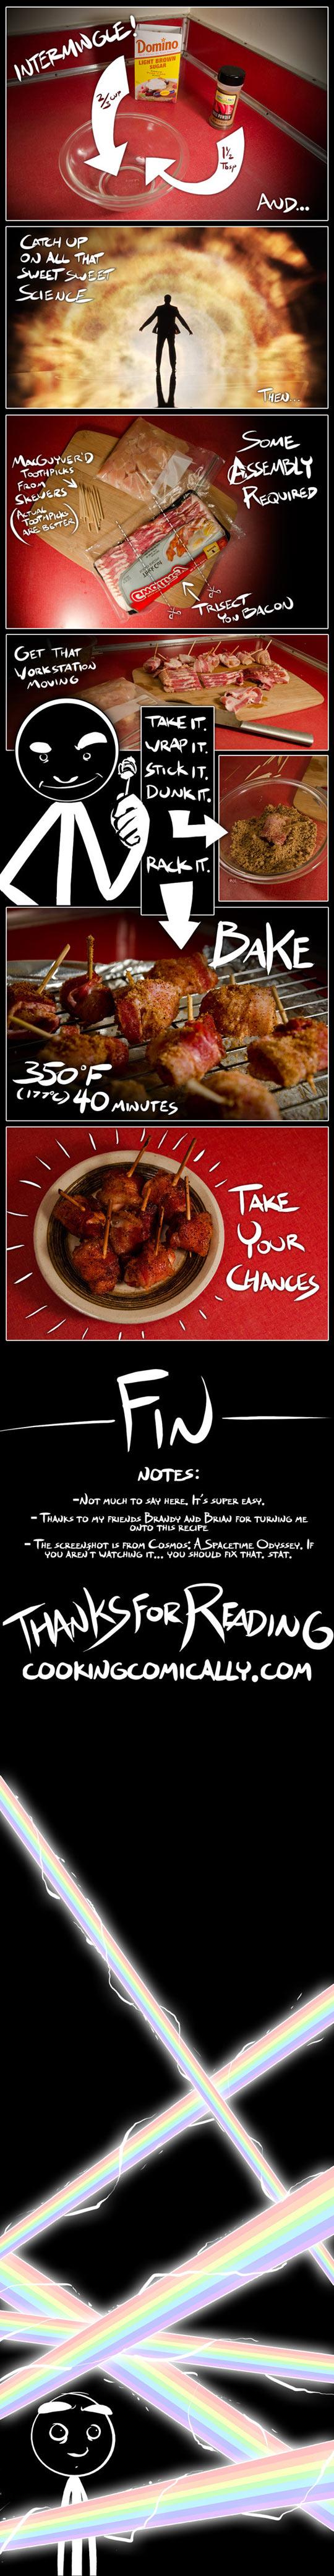 funny-explain-chicken-bacon-food-recipe-cook